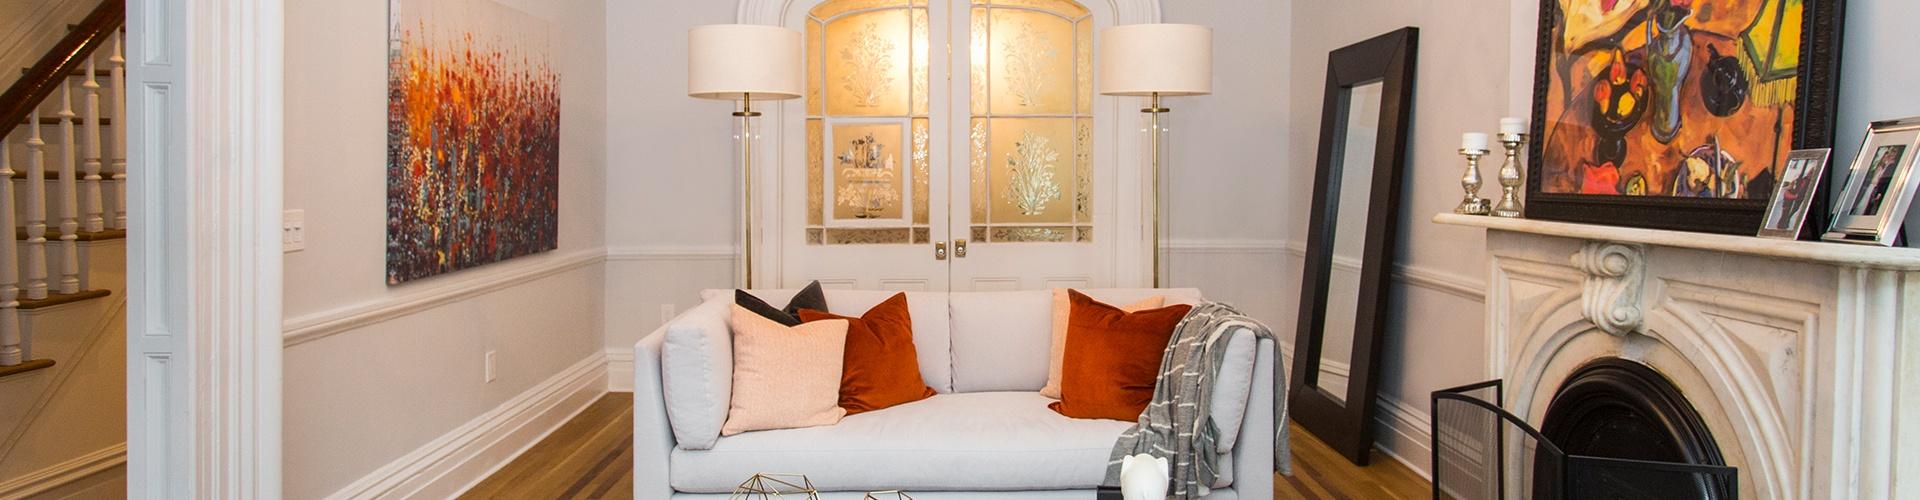 Top 3 Interior Design Tips